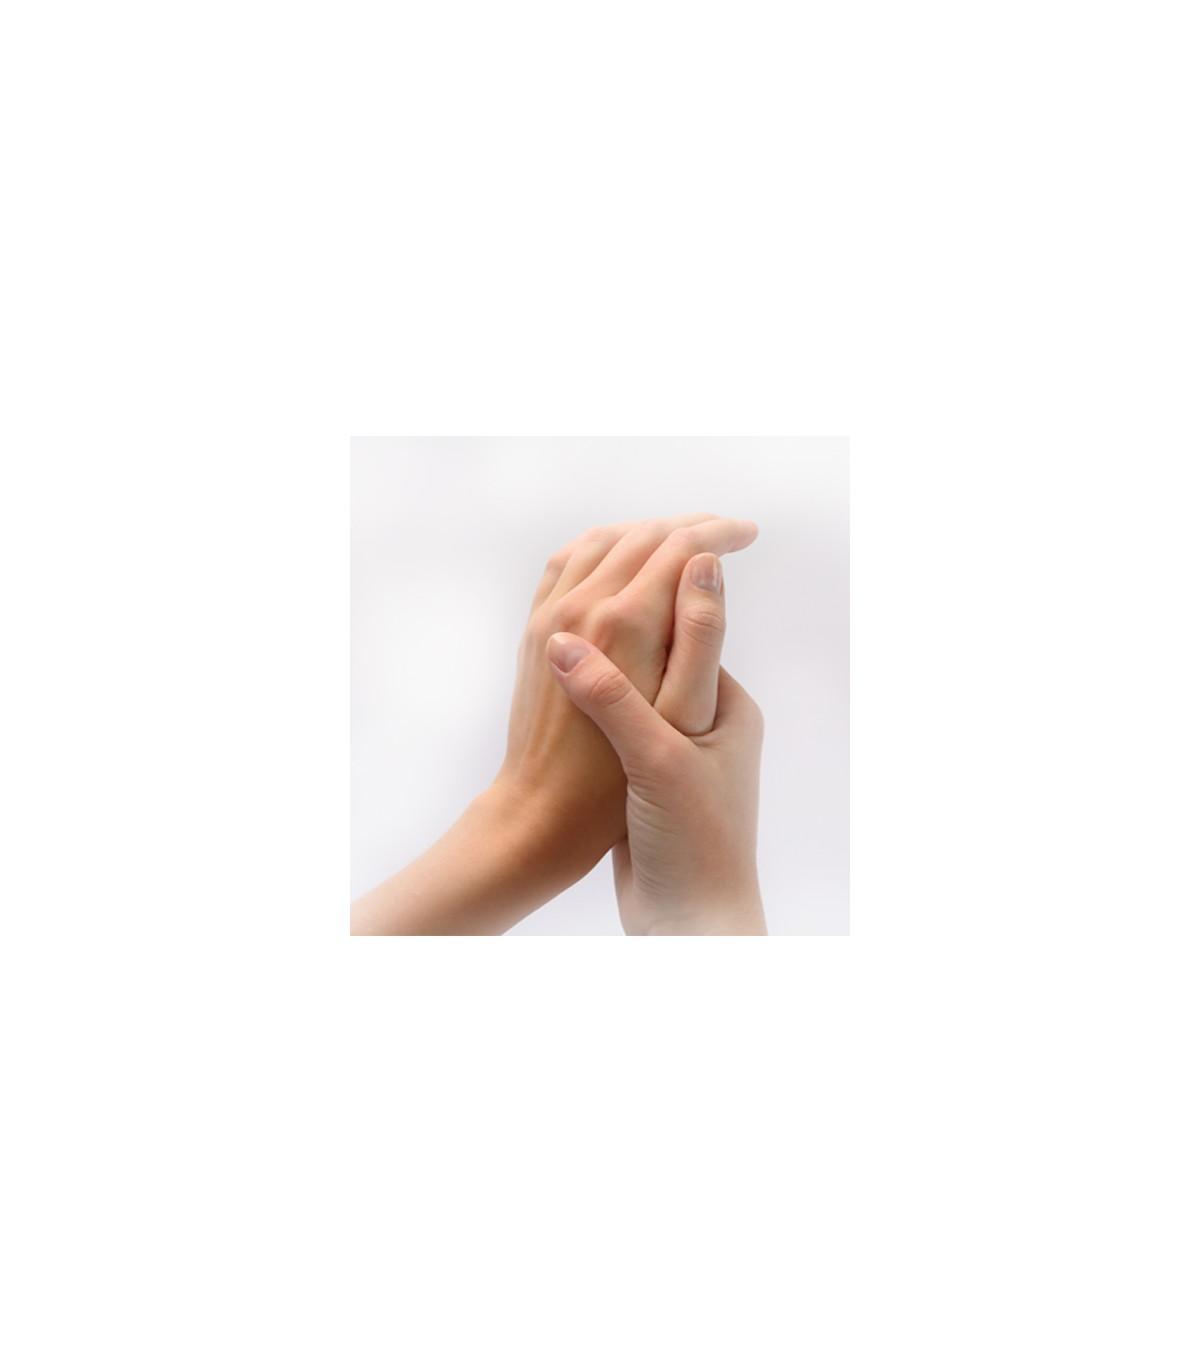 Aseptoman محلول ضدعفونی کننده دست 500 میلی لیتری آسپتومن